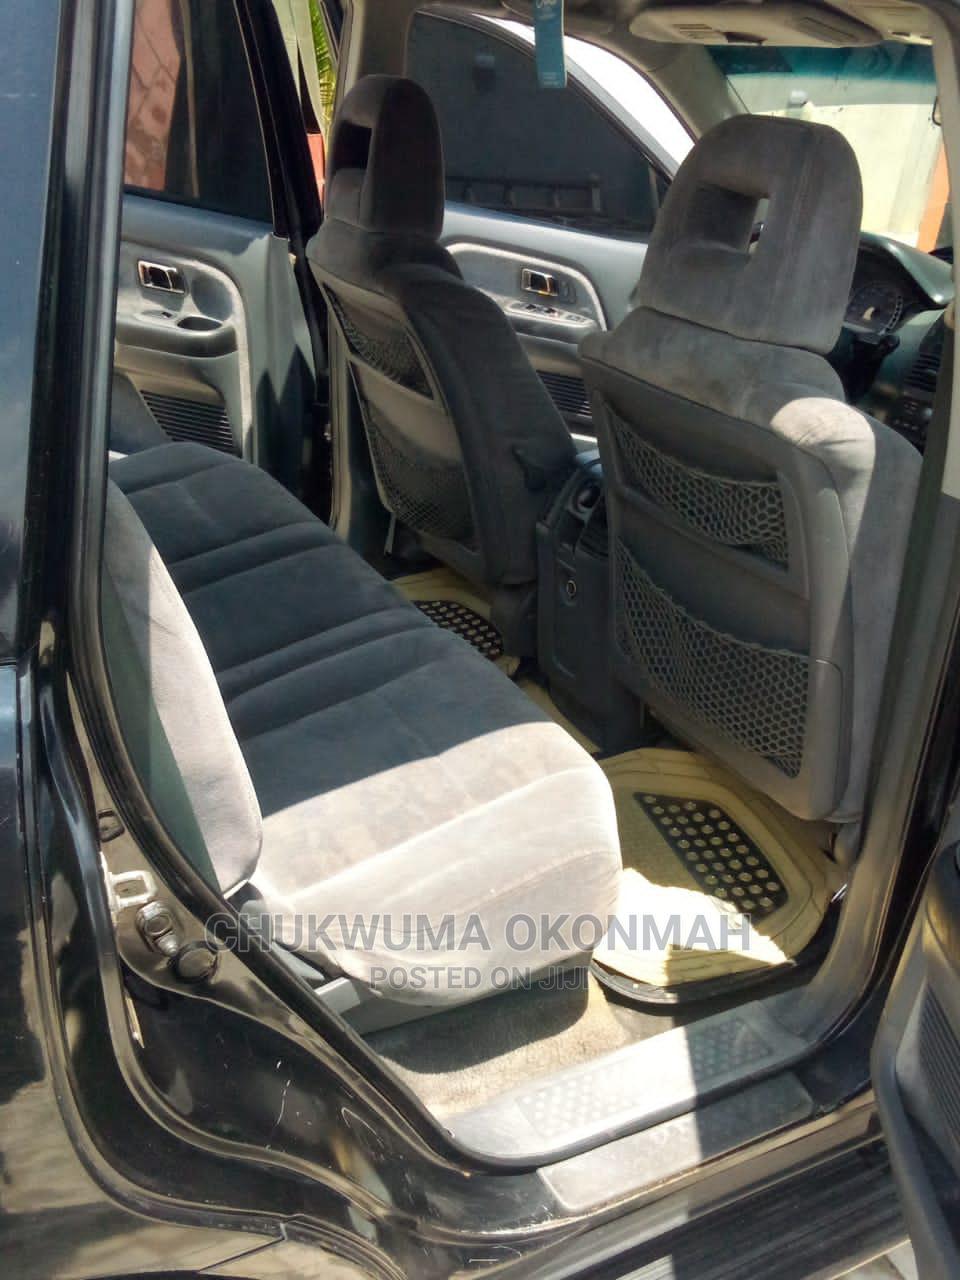 Honda Pilot 2004 Black   Cars for sale in Port-Harcourt, Rivers State, Nigeria